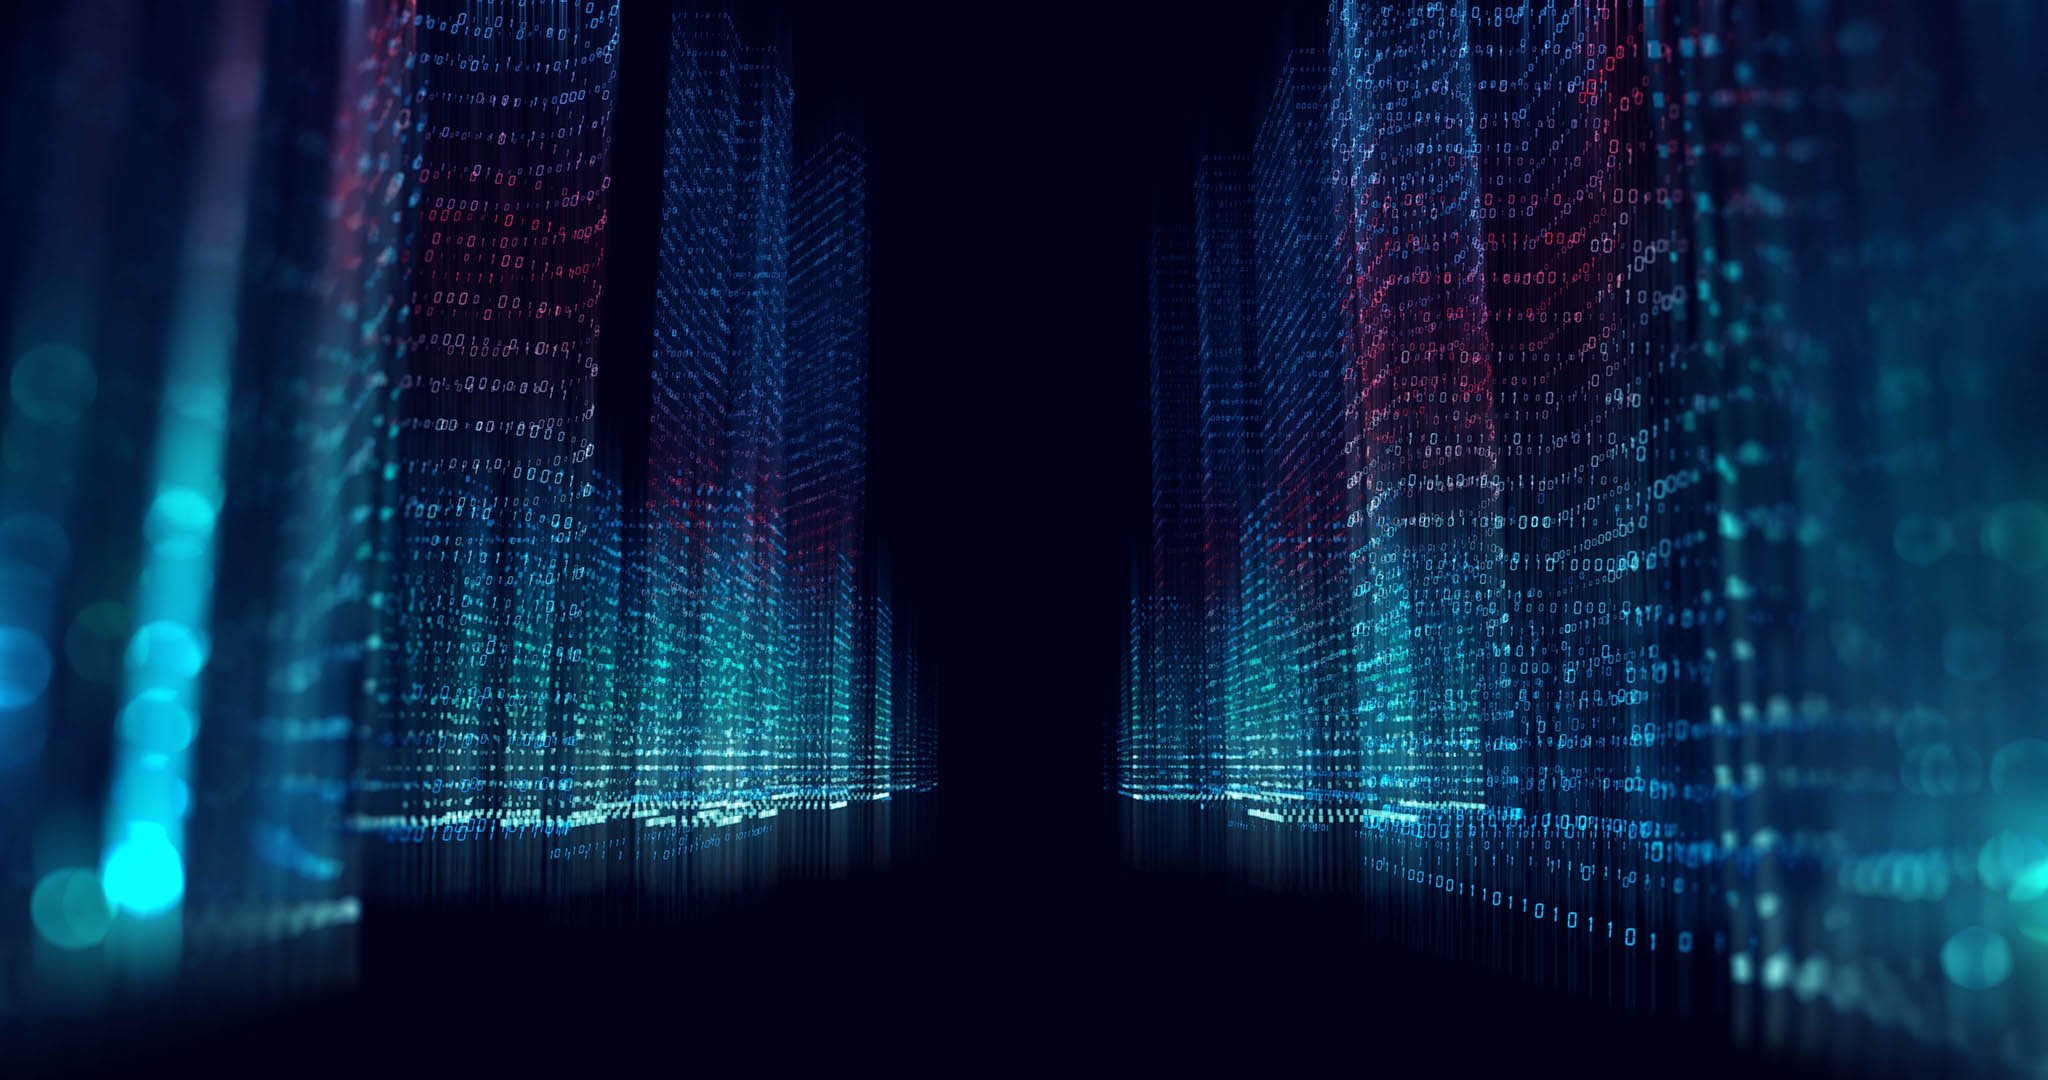 Digital Transformation Digitization